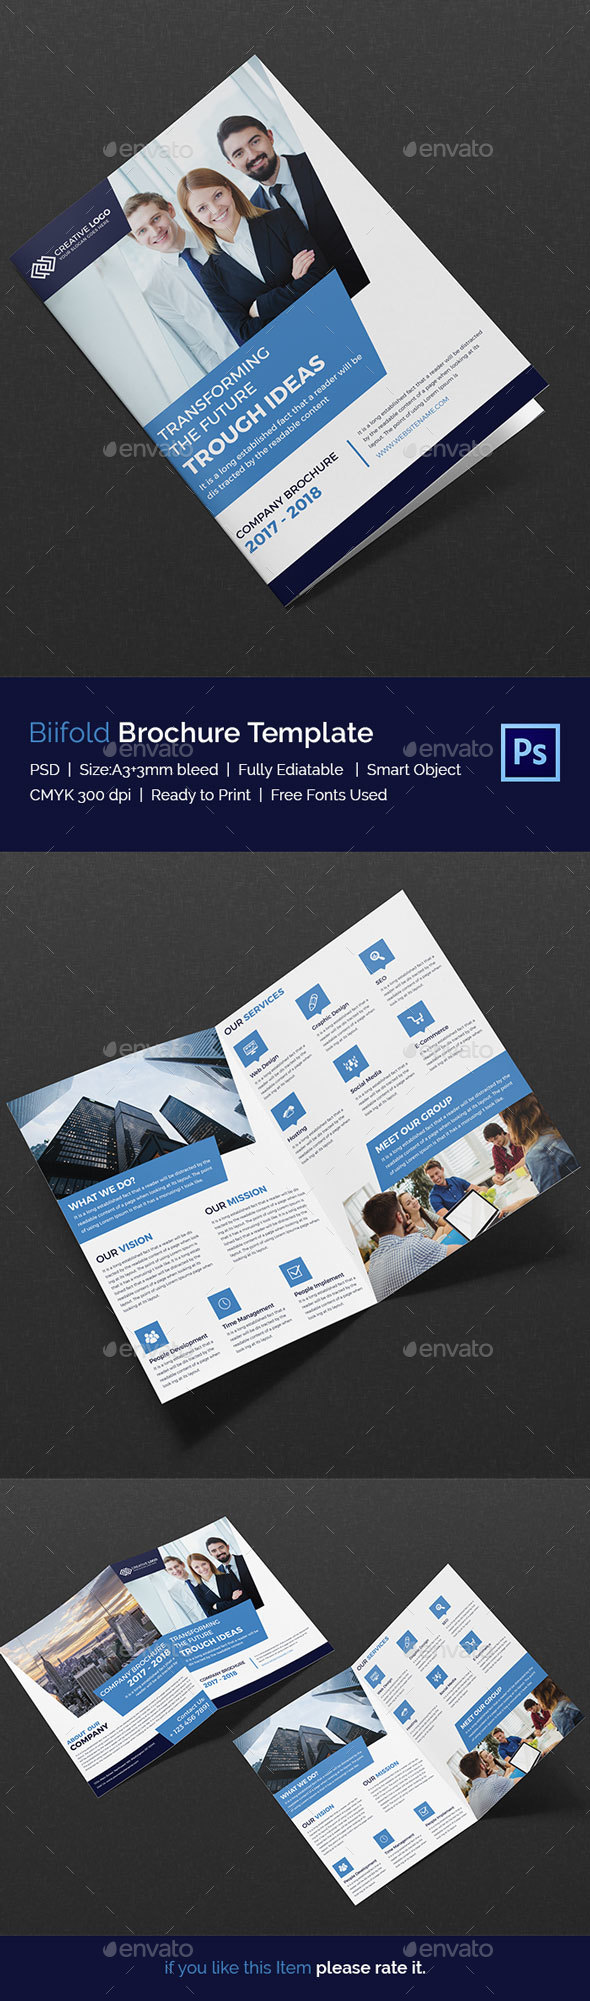 Bifold Brochure - Print Templates